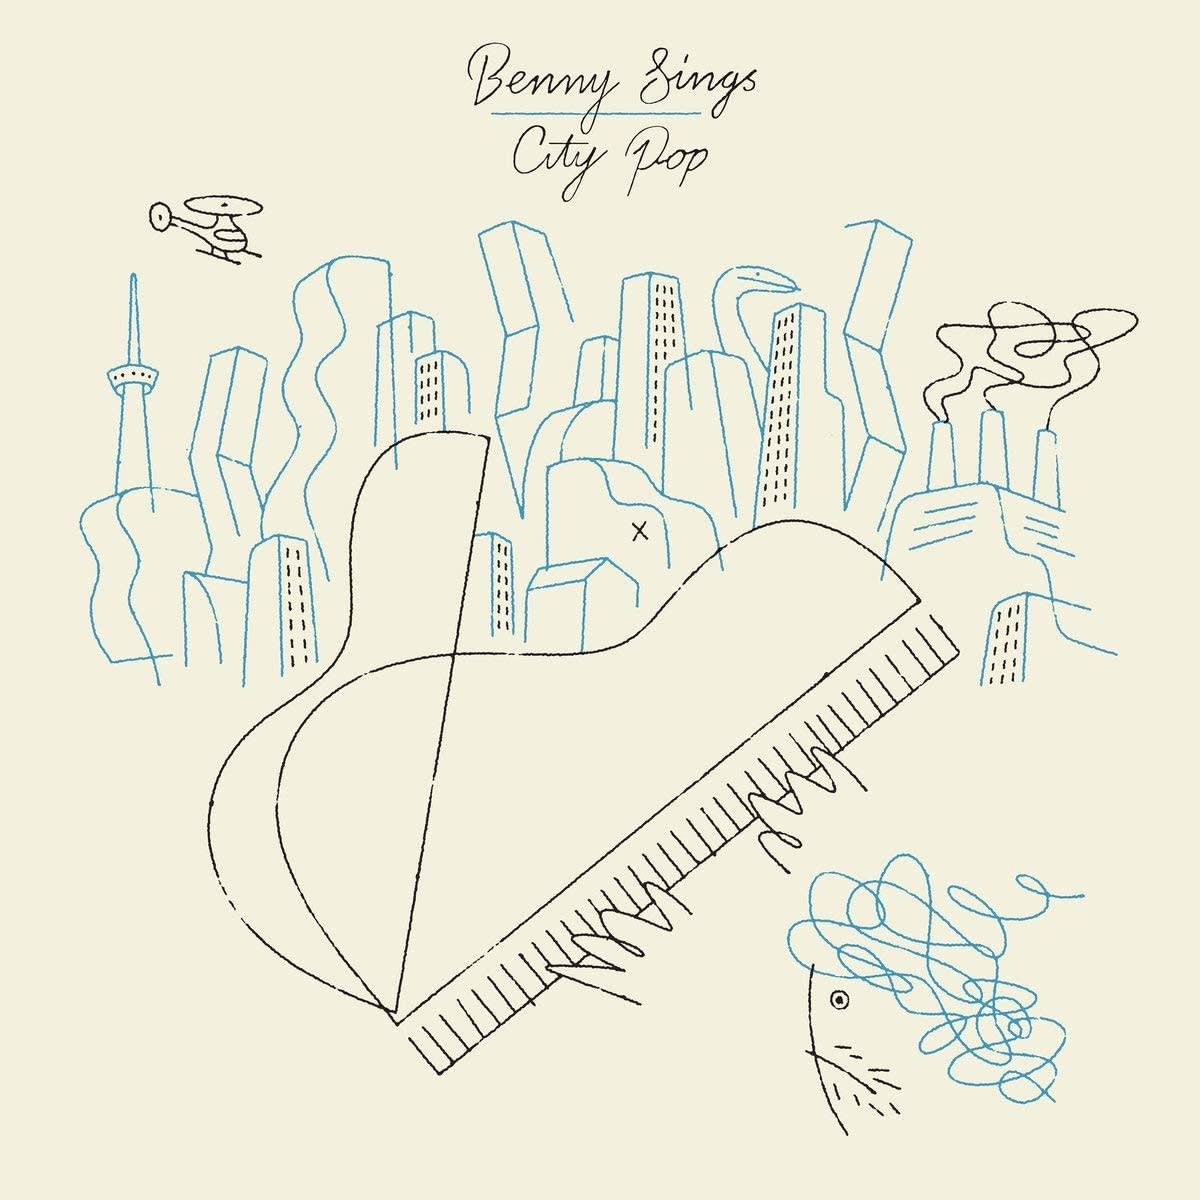 Benny Sings – City Pop